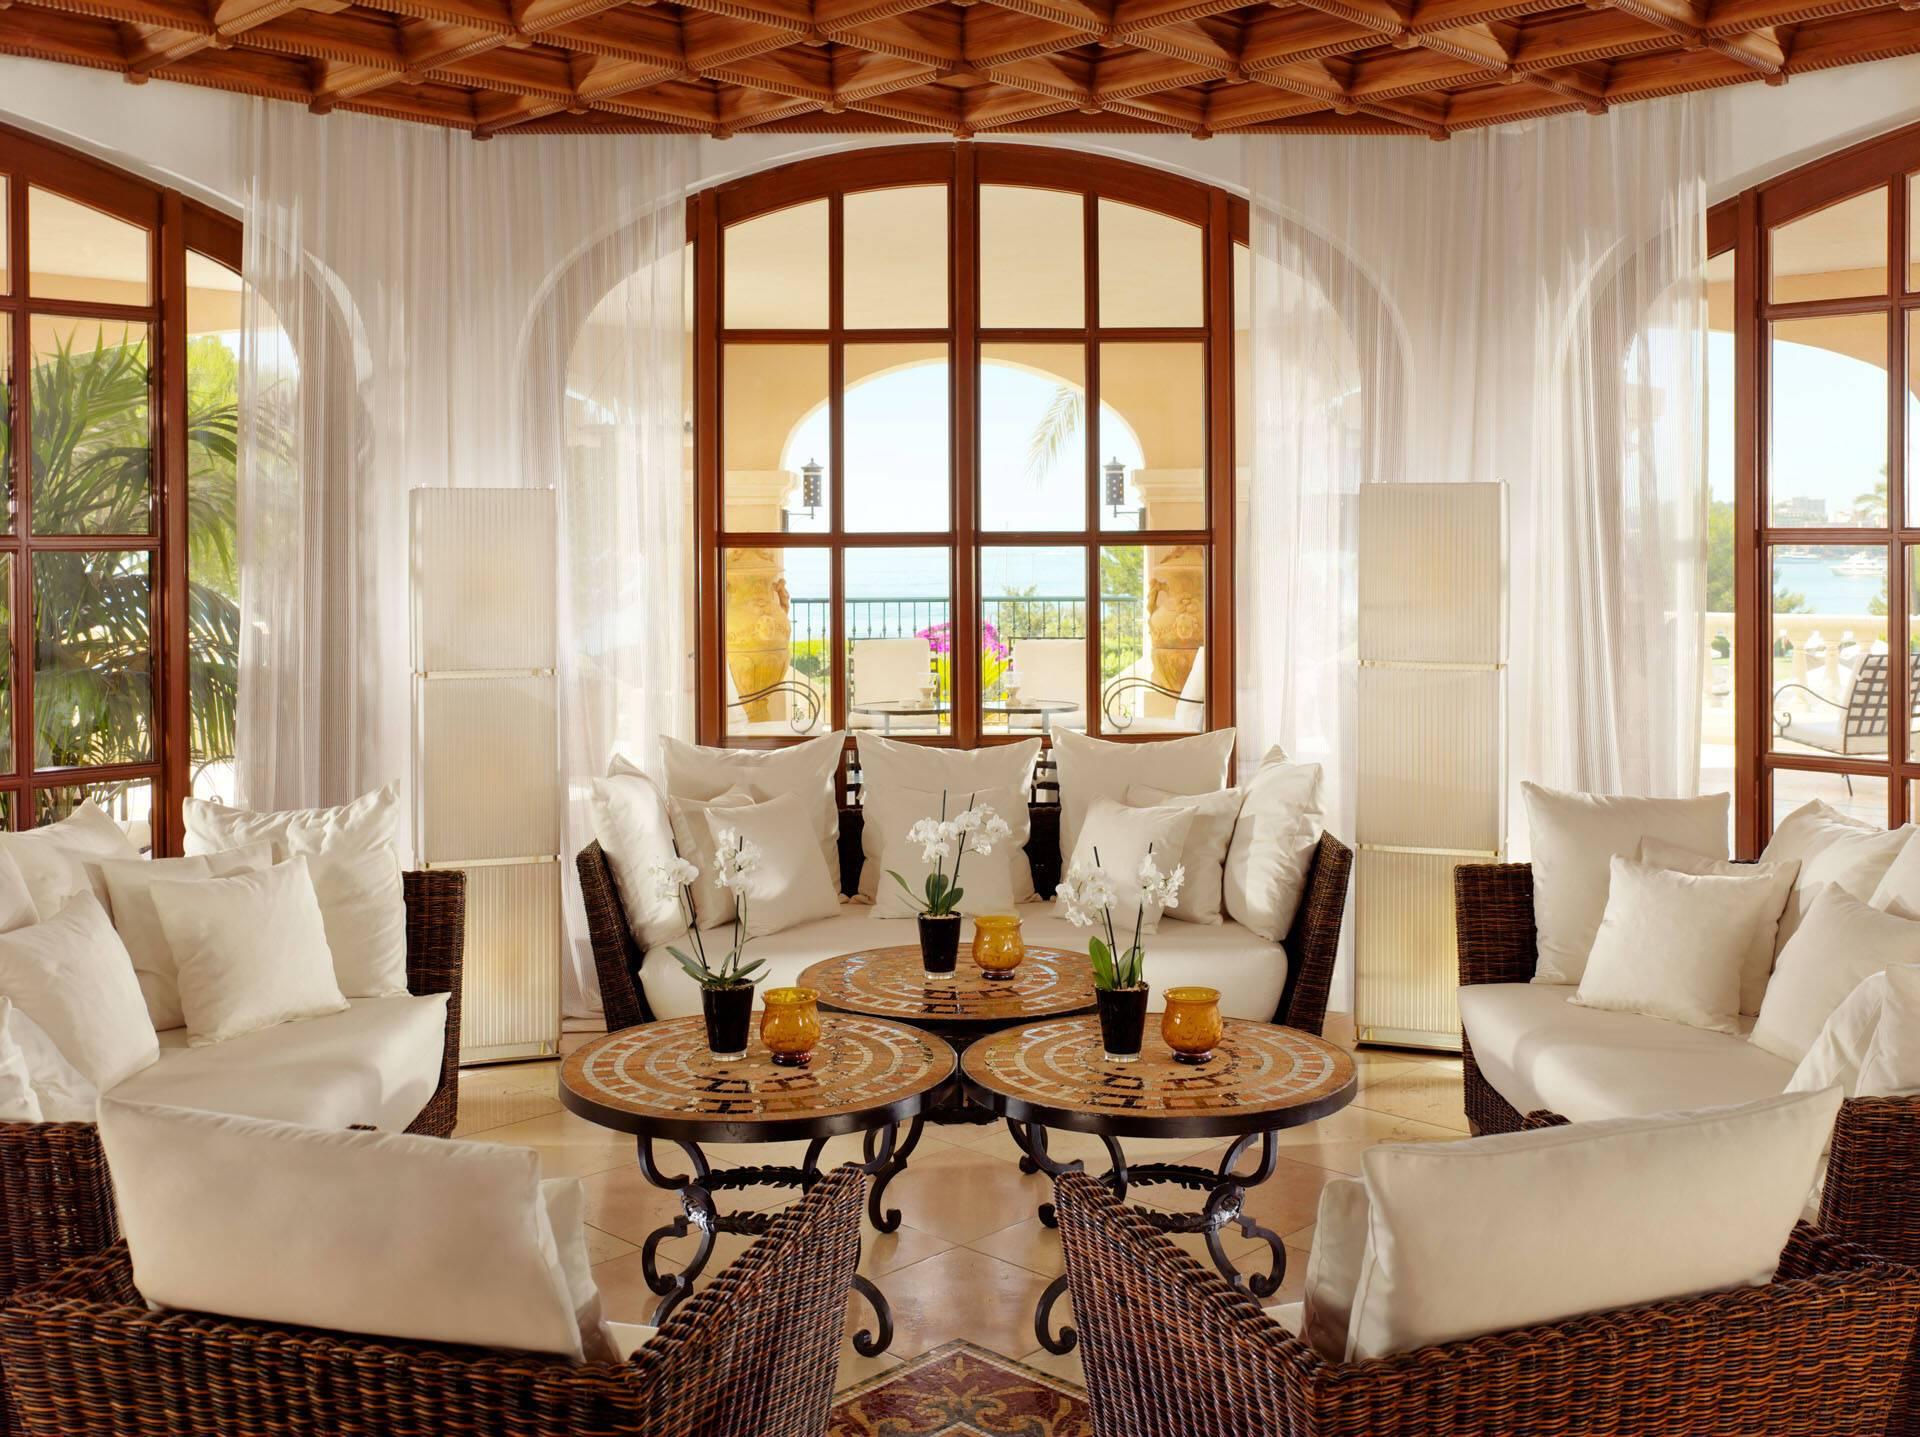 St Regis Mardavall Resort Majorque Moroccan Lounge